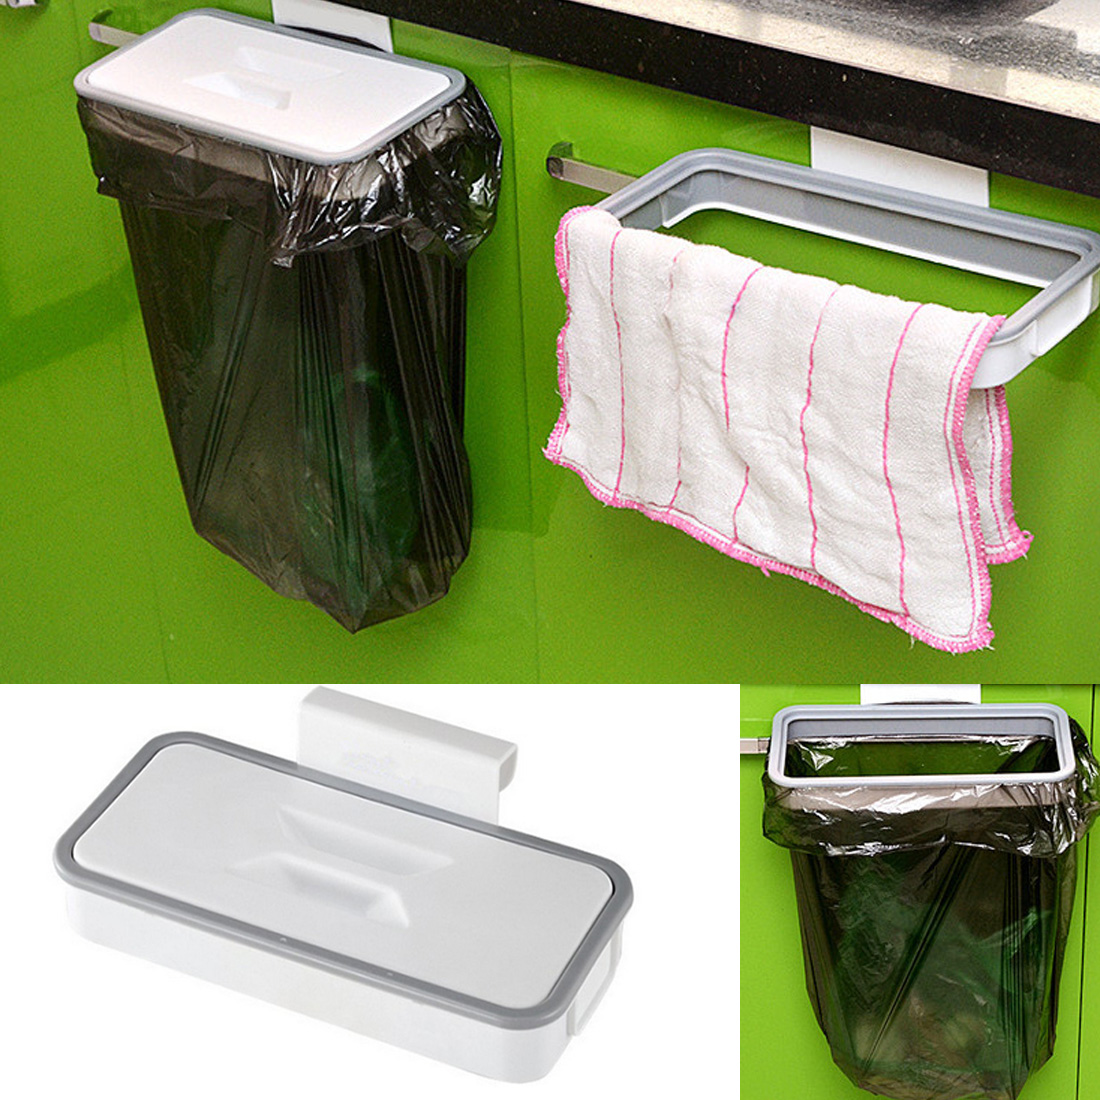 Plastic Cabinet Door Hanging Trash Can Waste Bin Garbage Basket Kitchen Tools